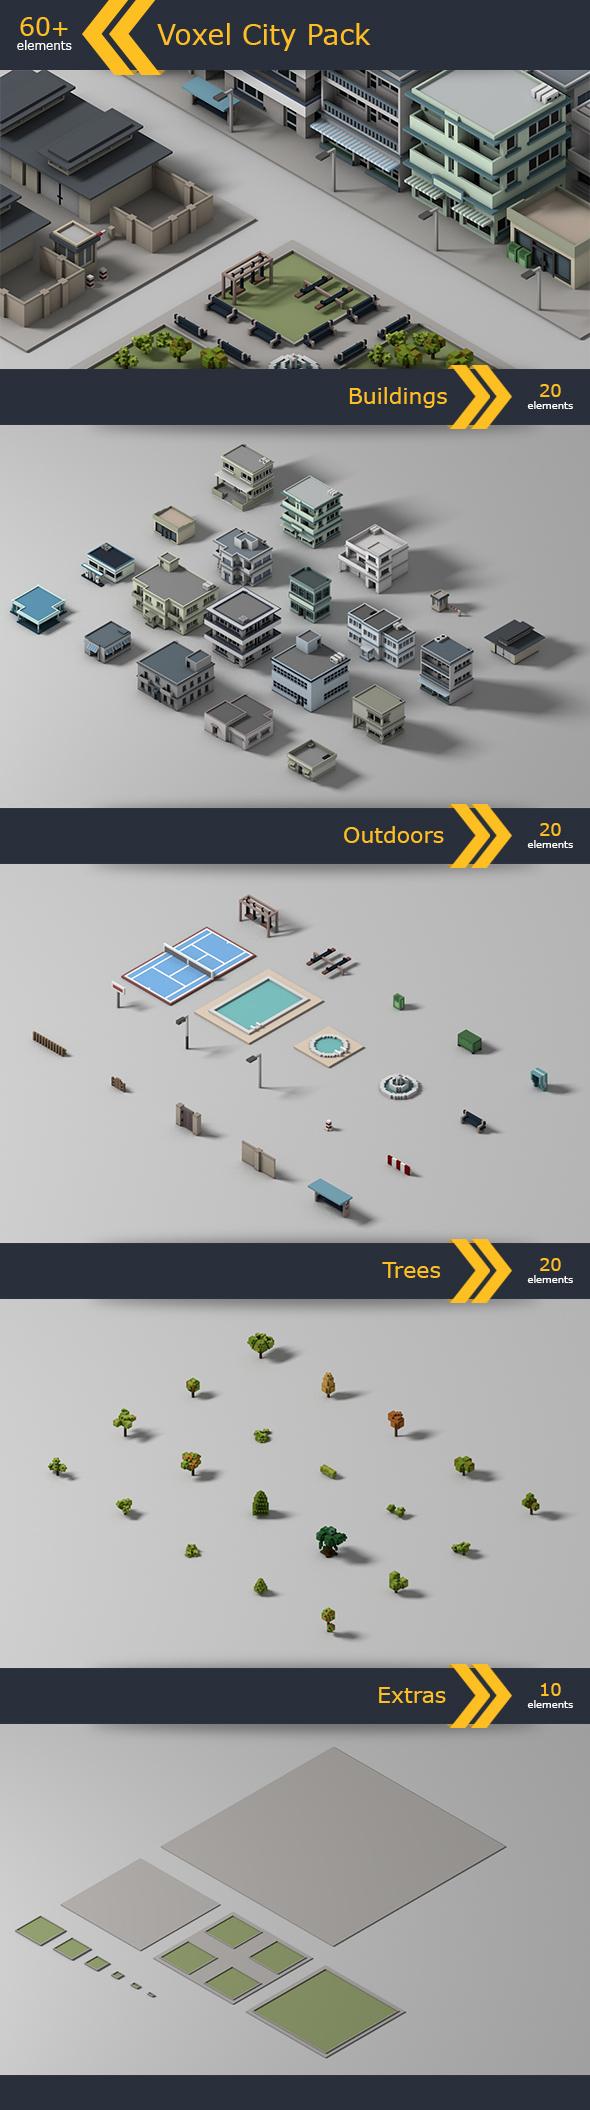 Voxel City Pack - 3DOcean Item for Sale